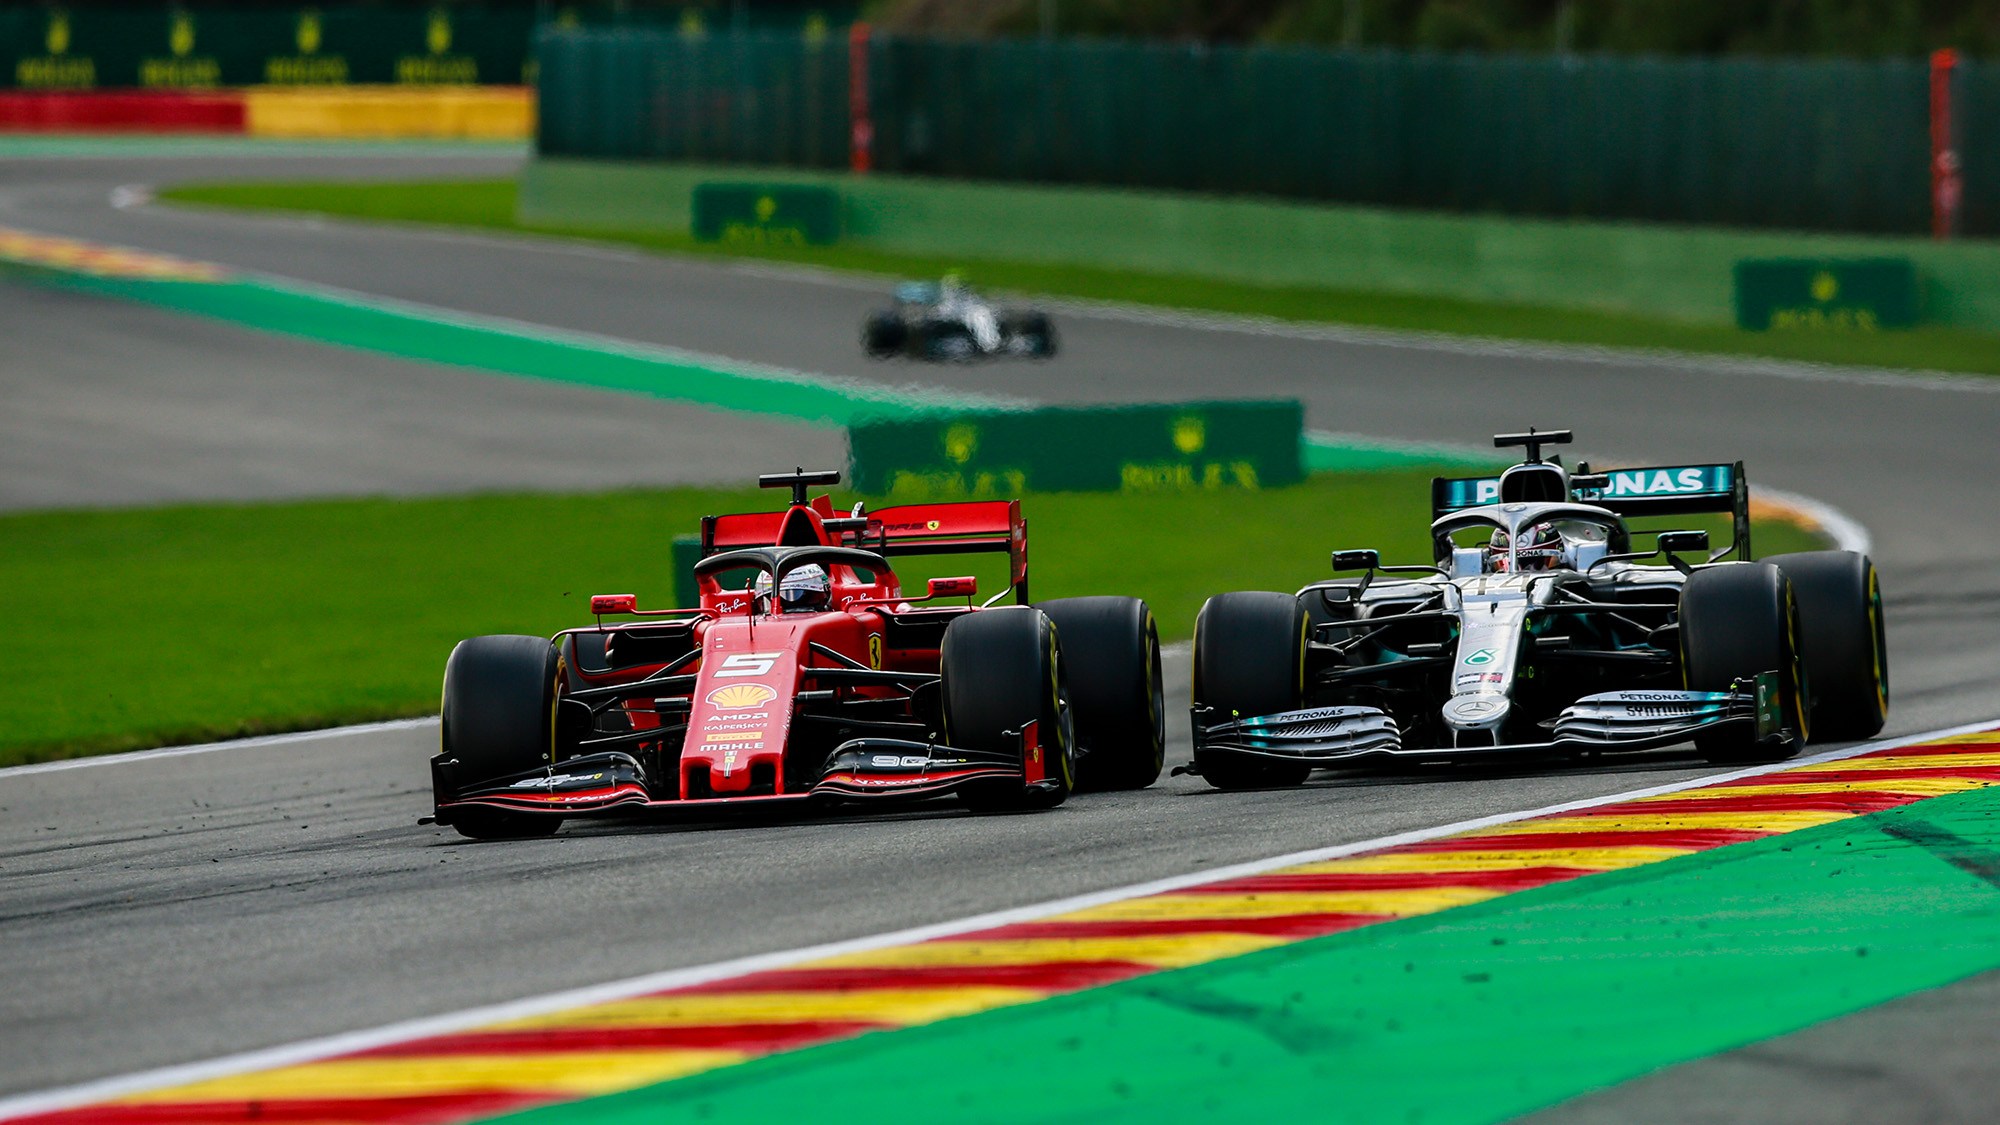 Lewis Hamilton and Sebastian Vettel battle at the 2019 Belgian Grand Prix